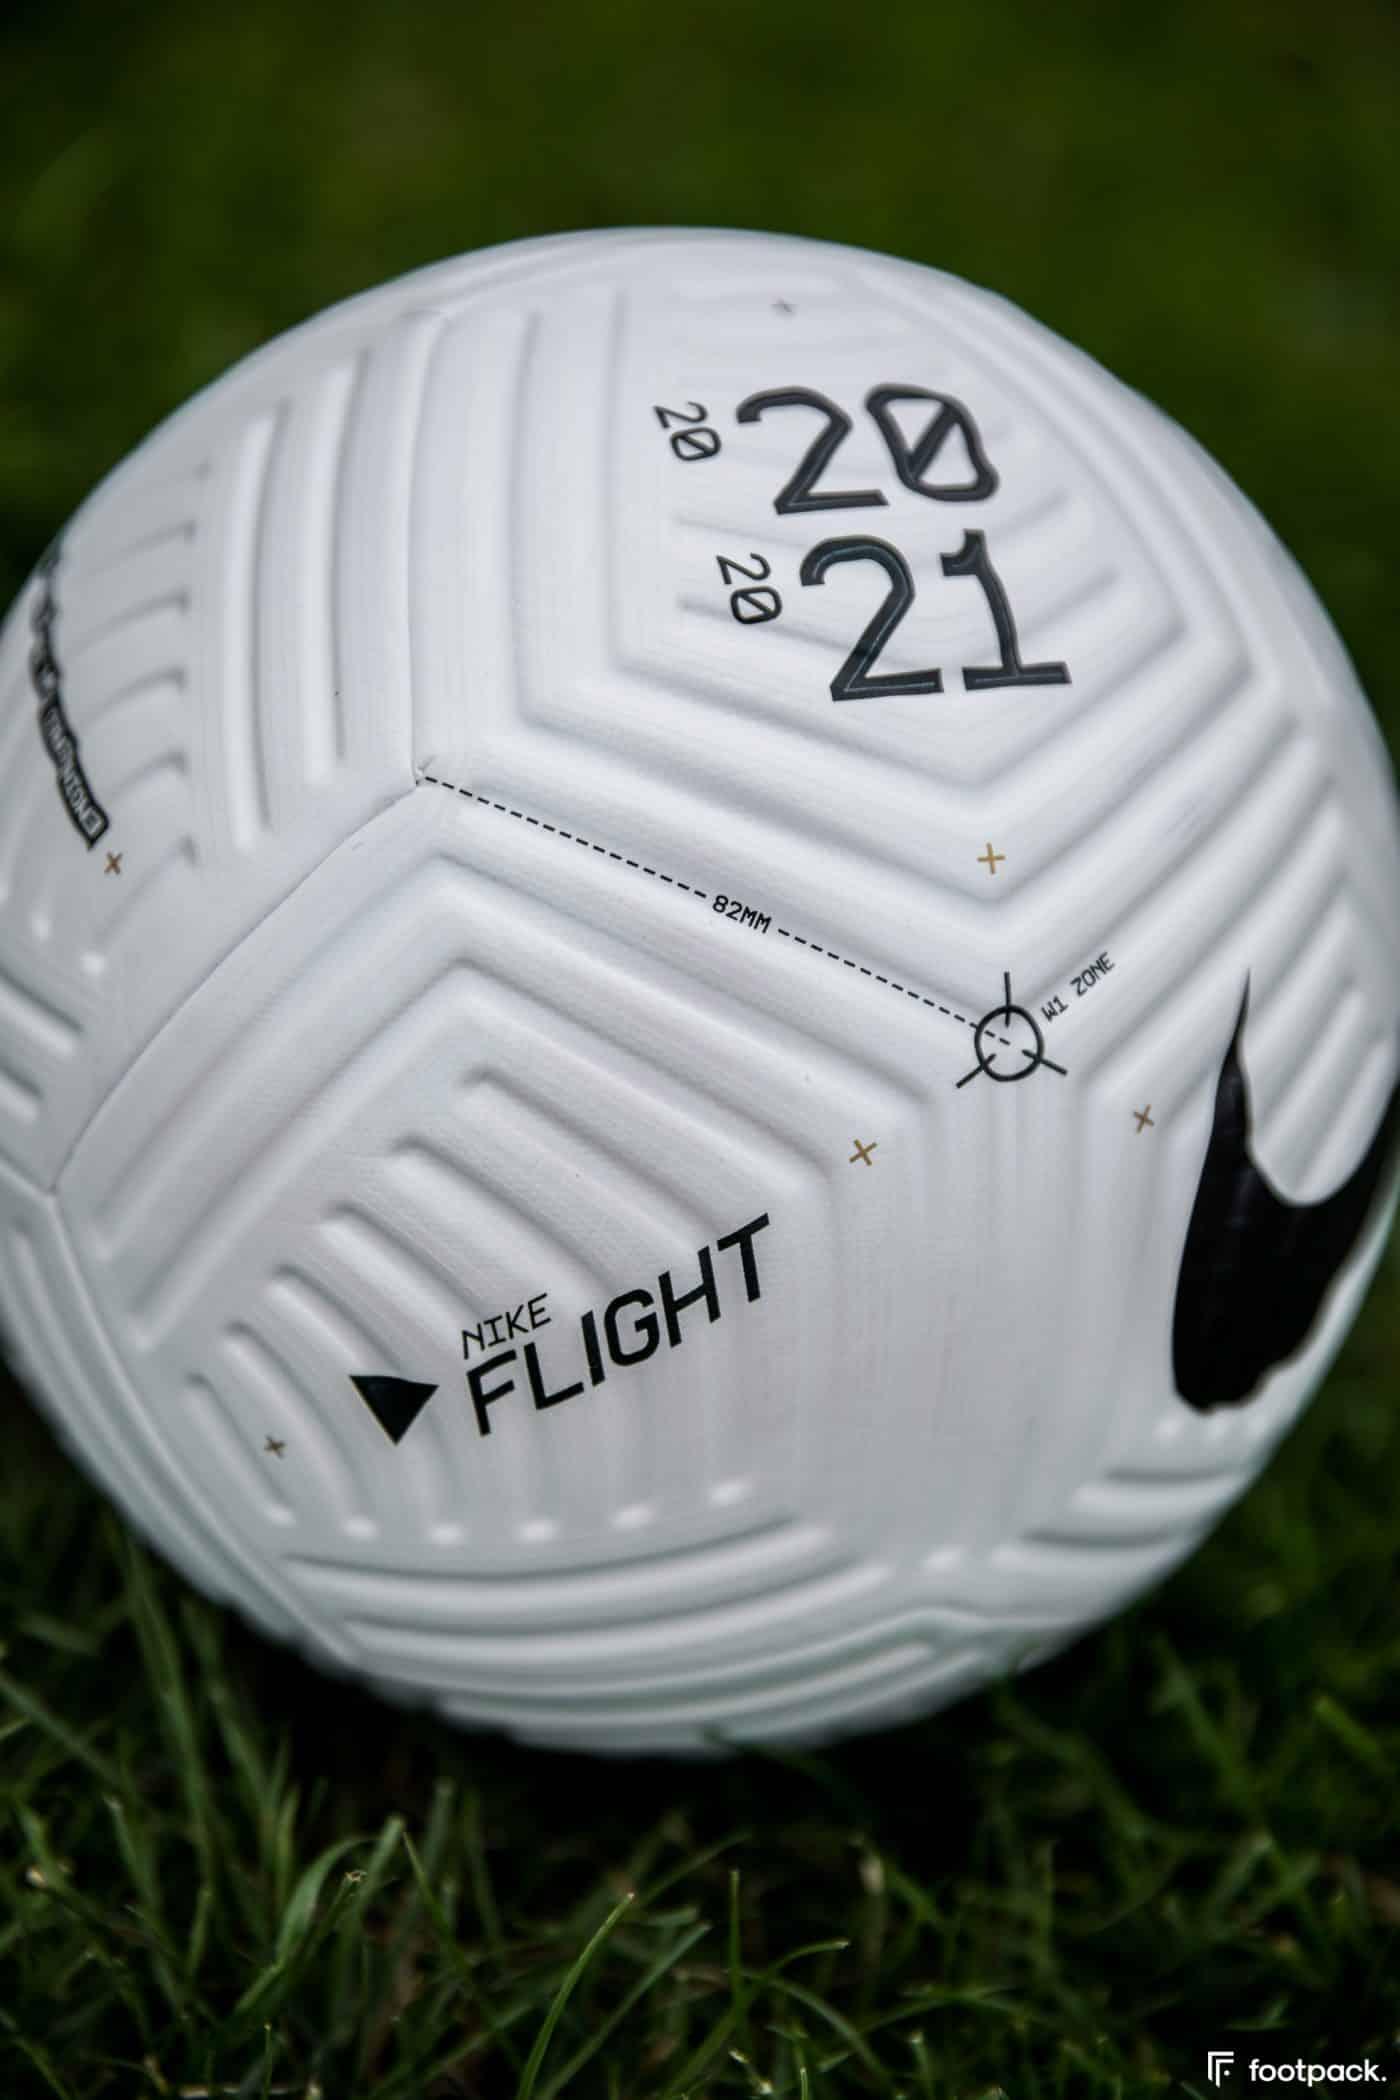 ballon-nike-flight-premier-league-serie-a-footpack-27